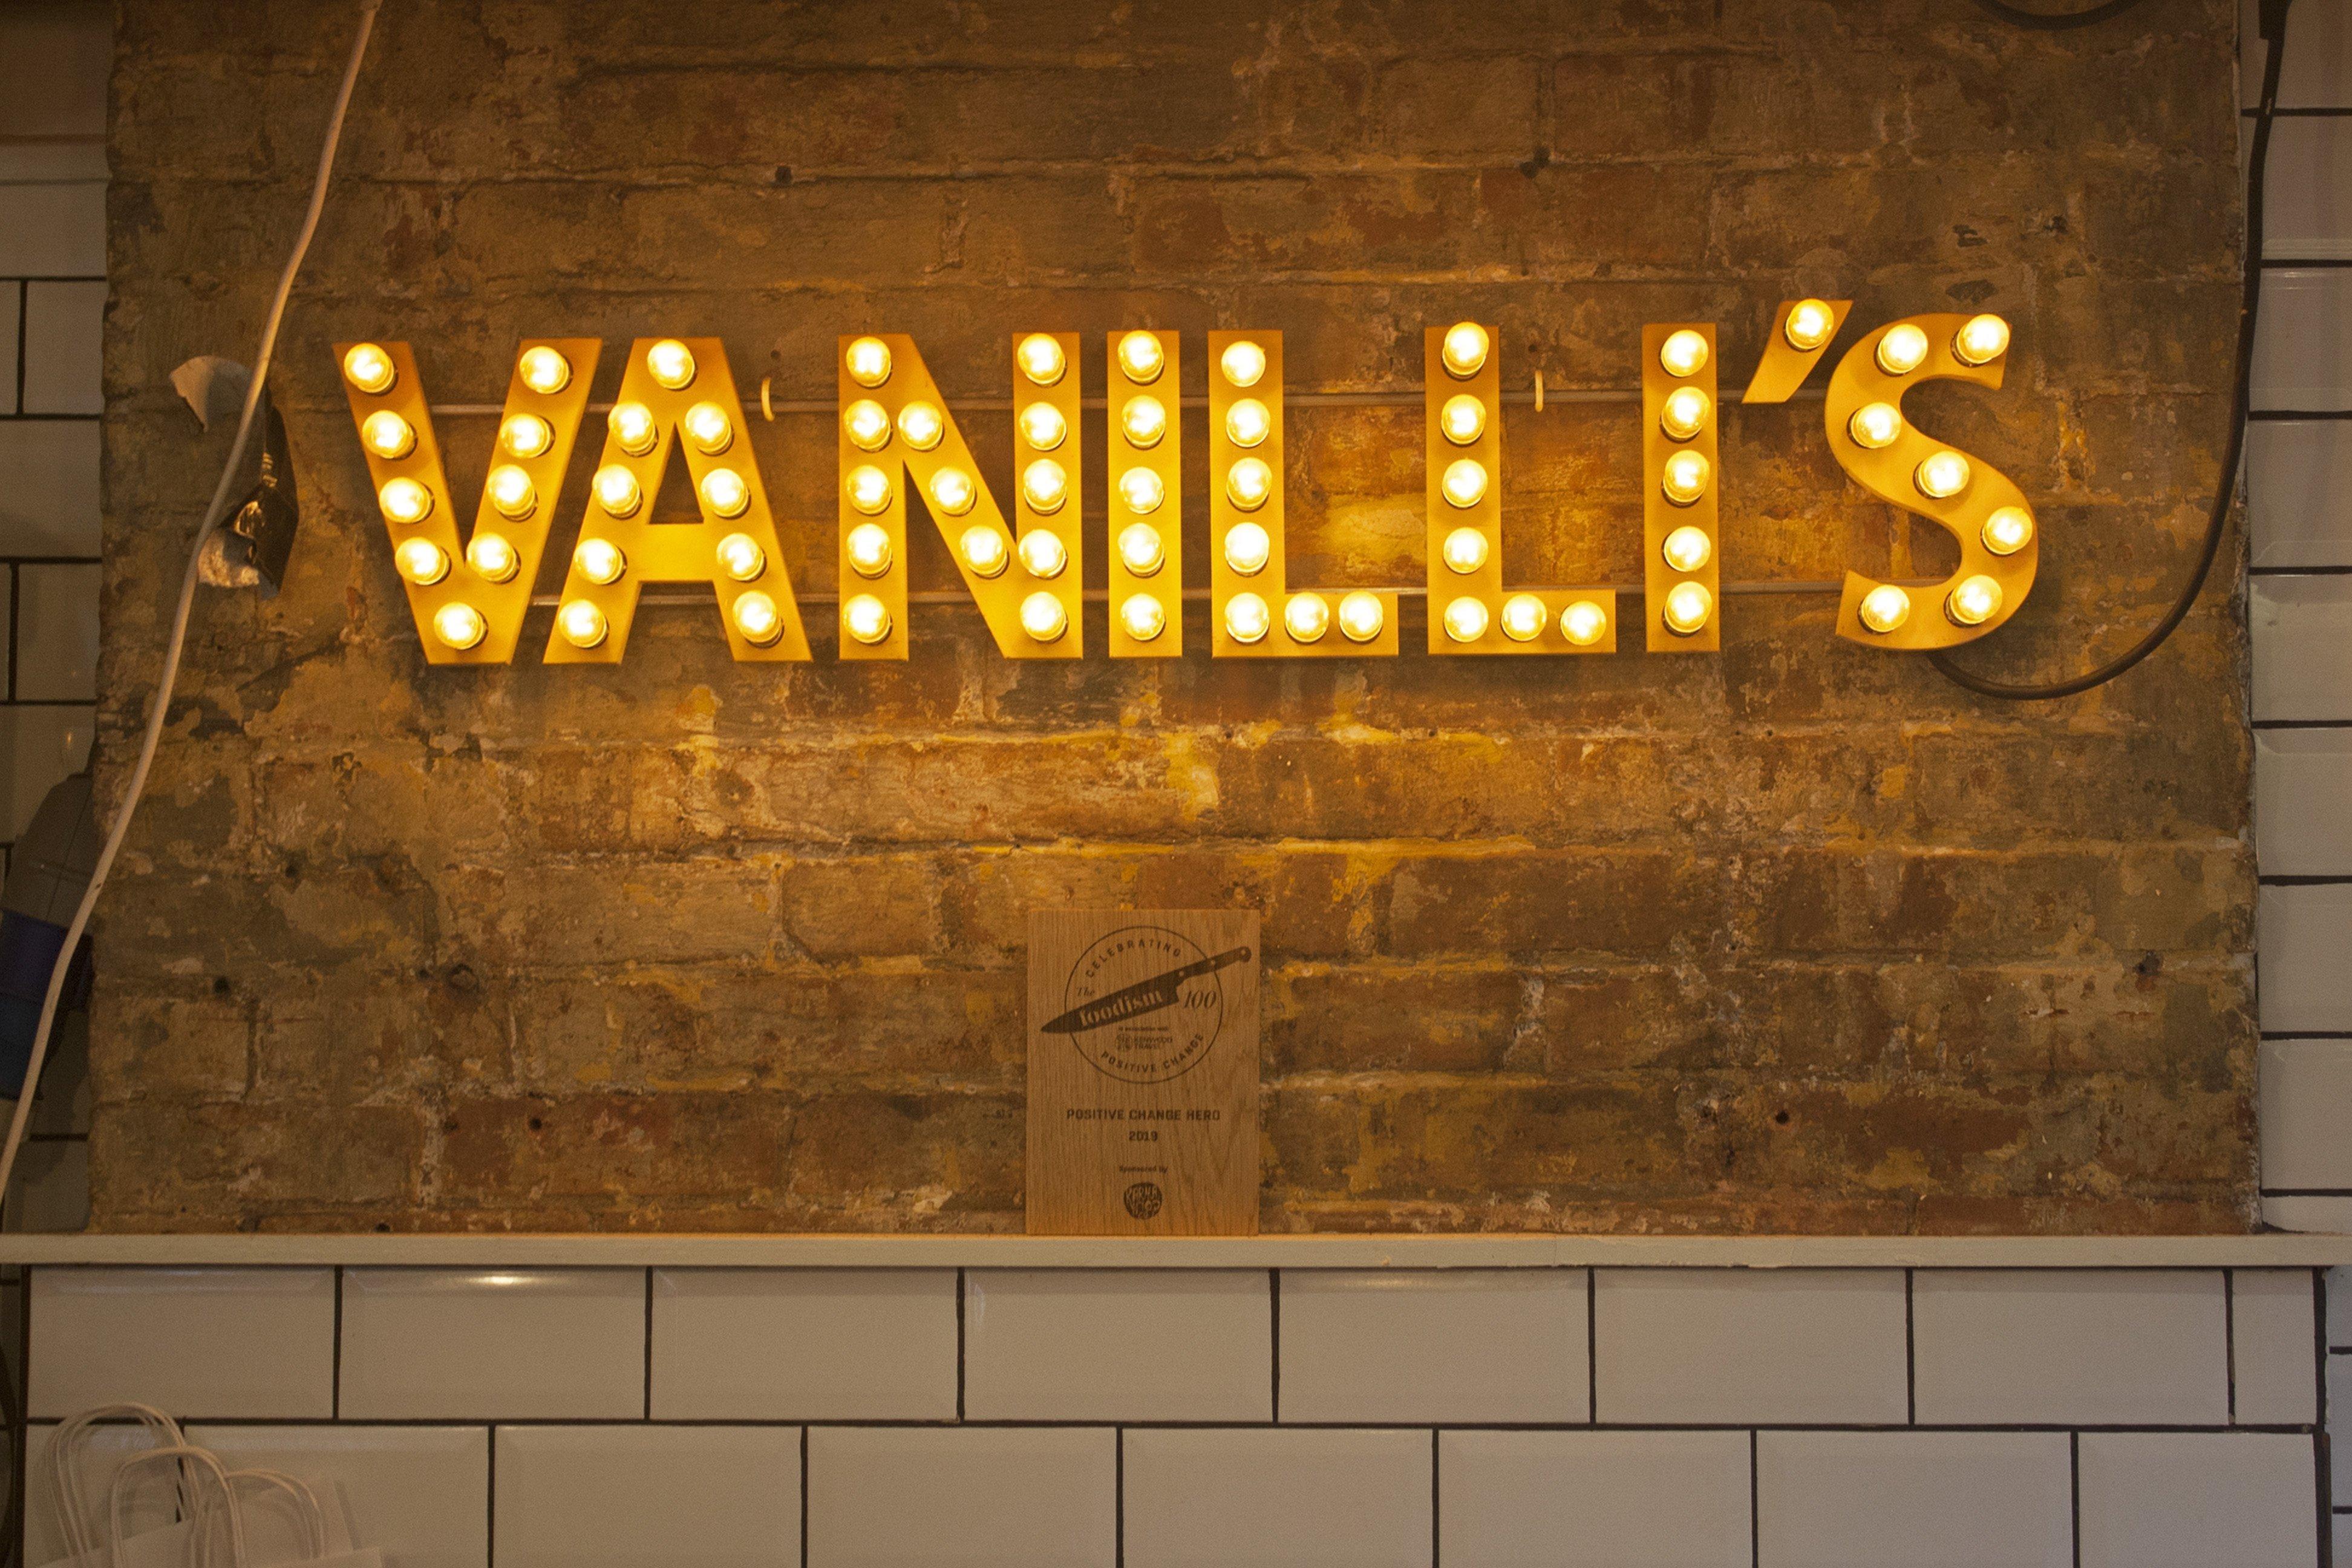 Lily Vanilli Bakery Vanilli's sign